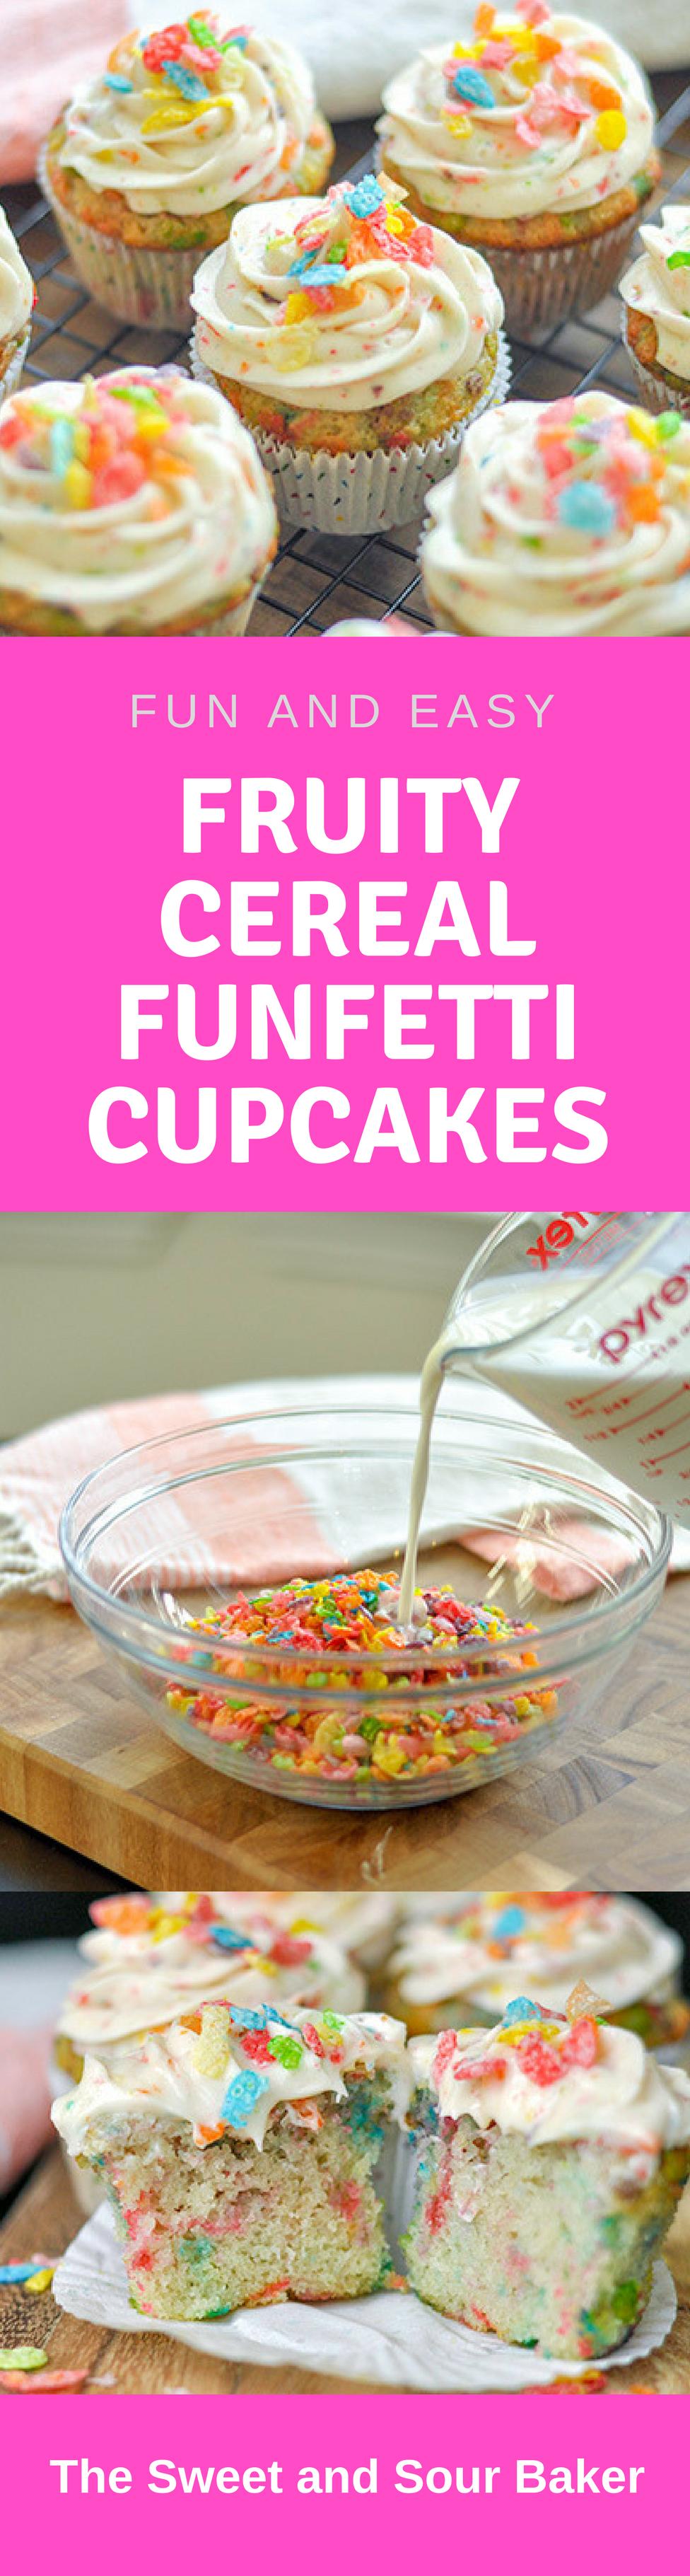 Fruity Cereal Funfetti Cupcakes